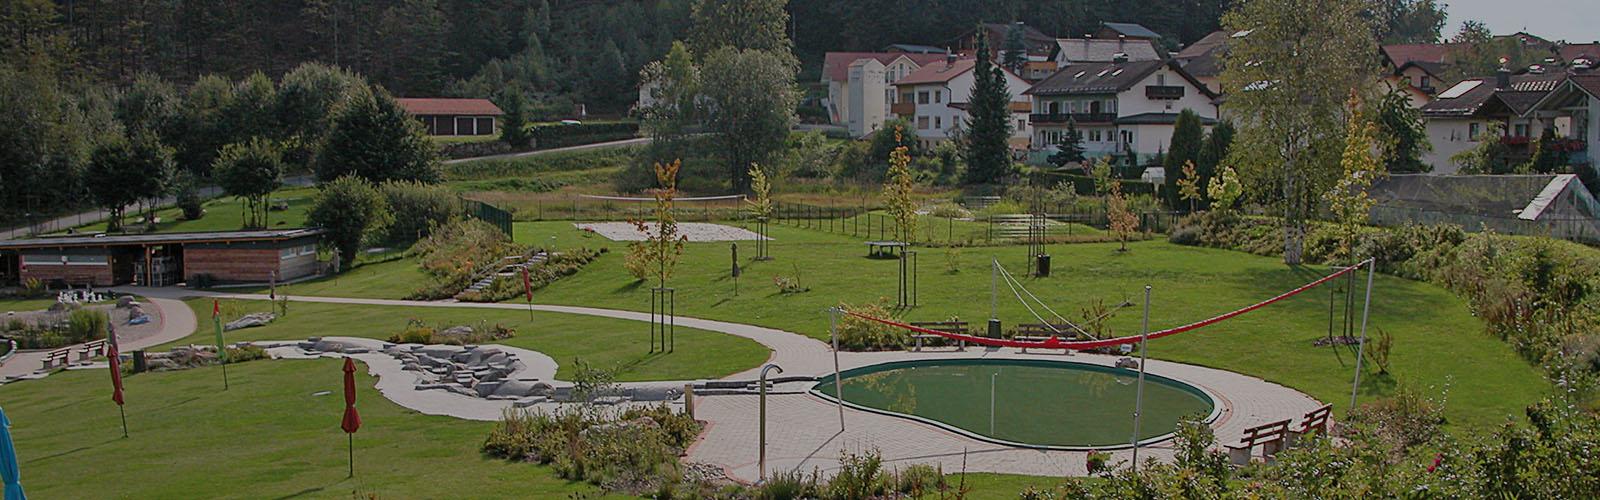 Freibad, Spiegelau